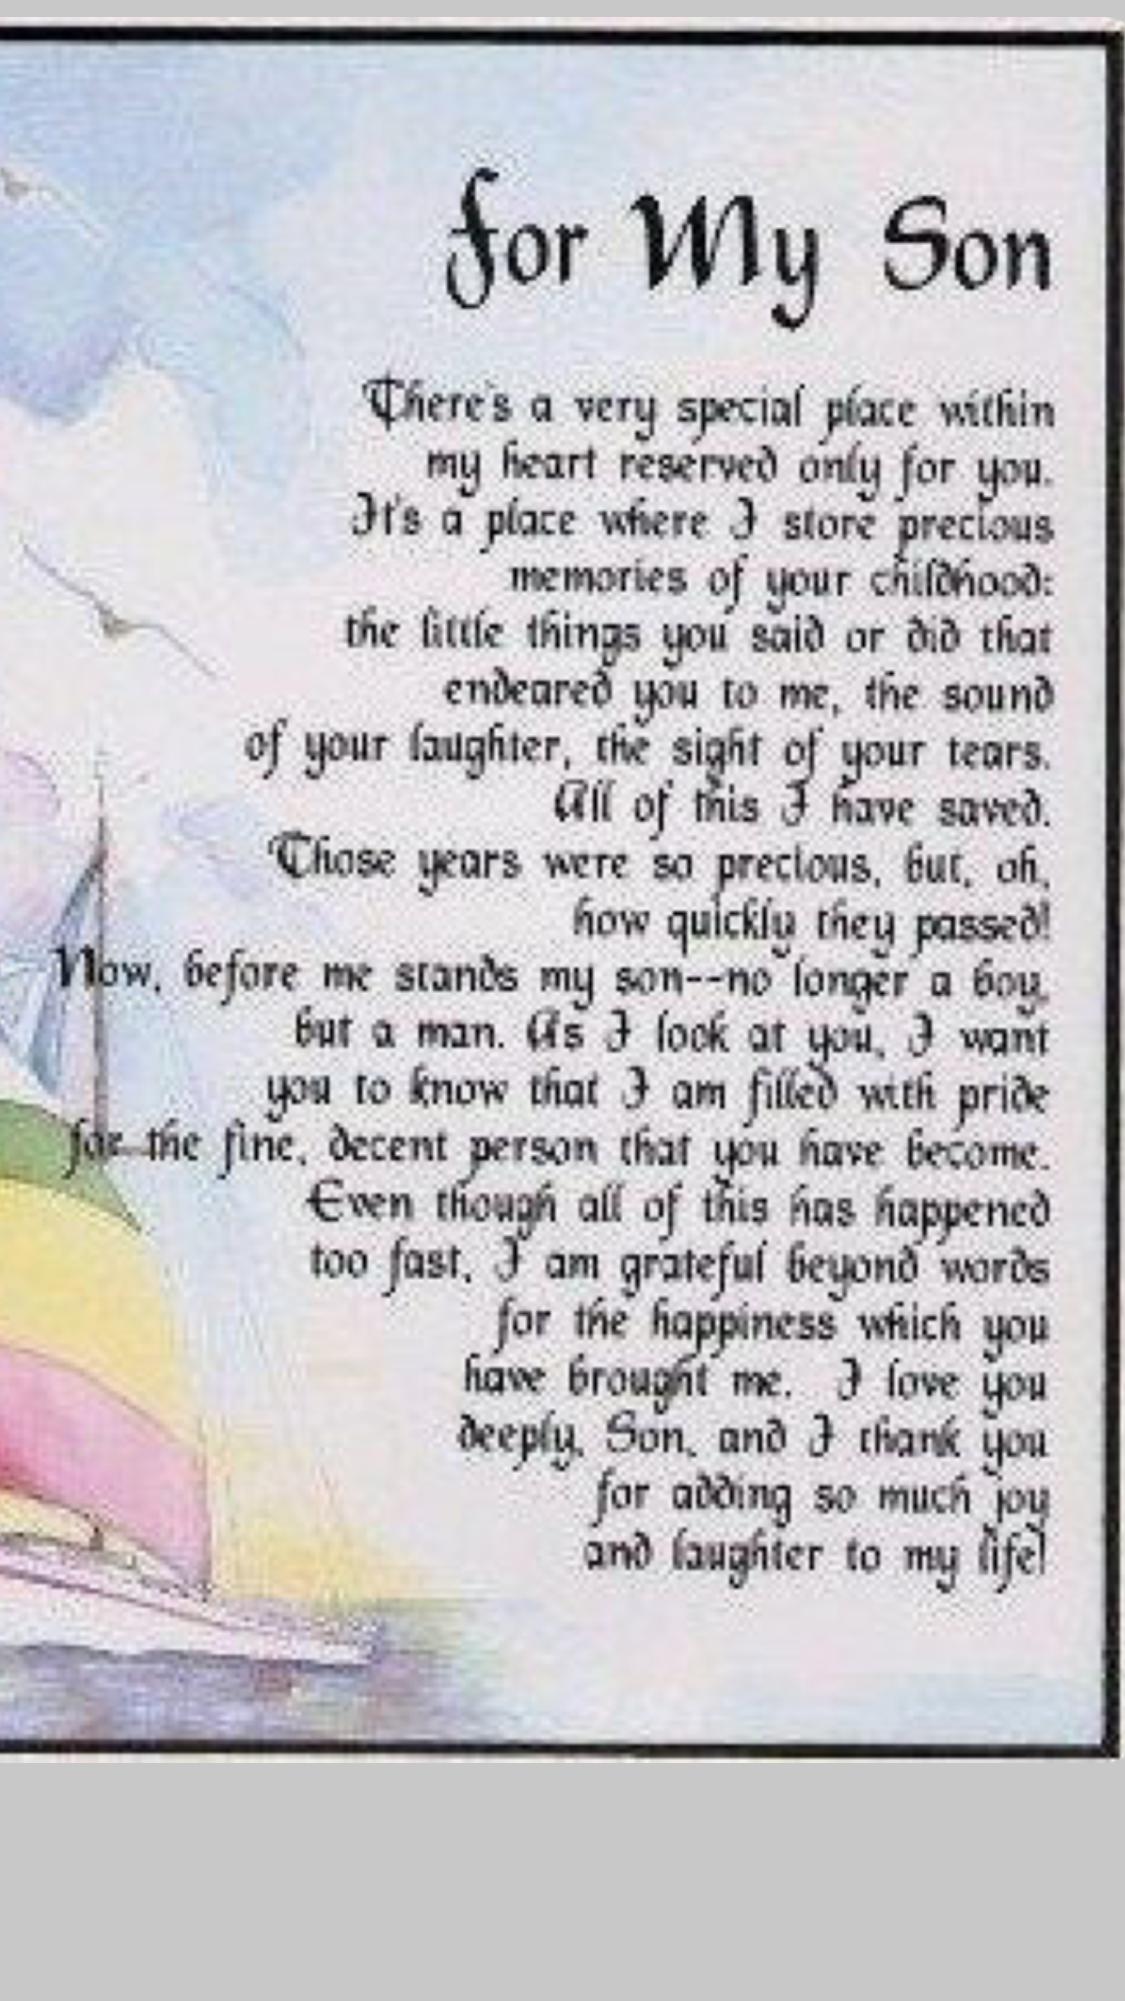 Pin by Shelley RosenChavez Avon Repr on Son Quotes Son